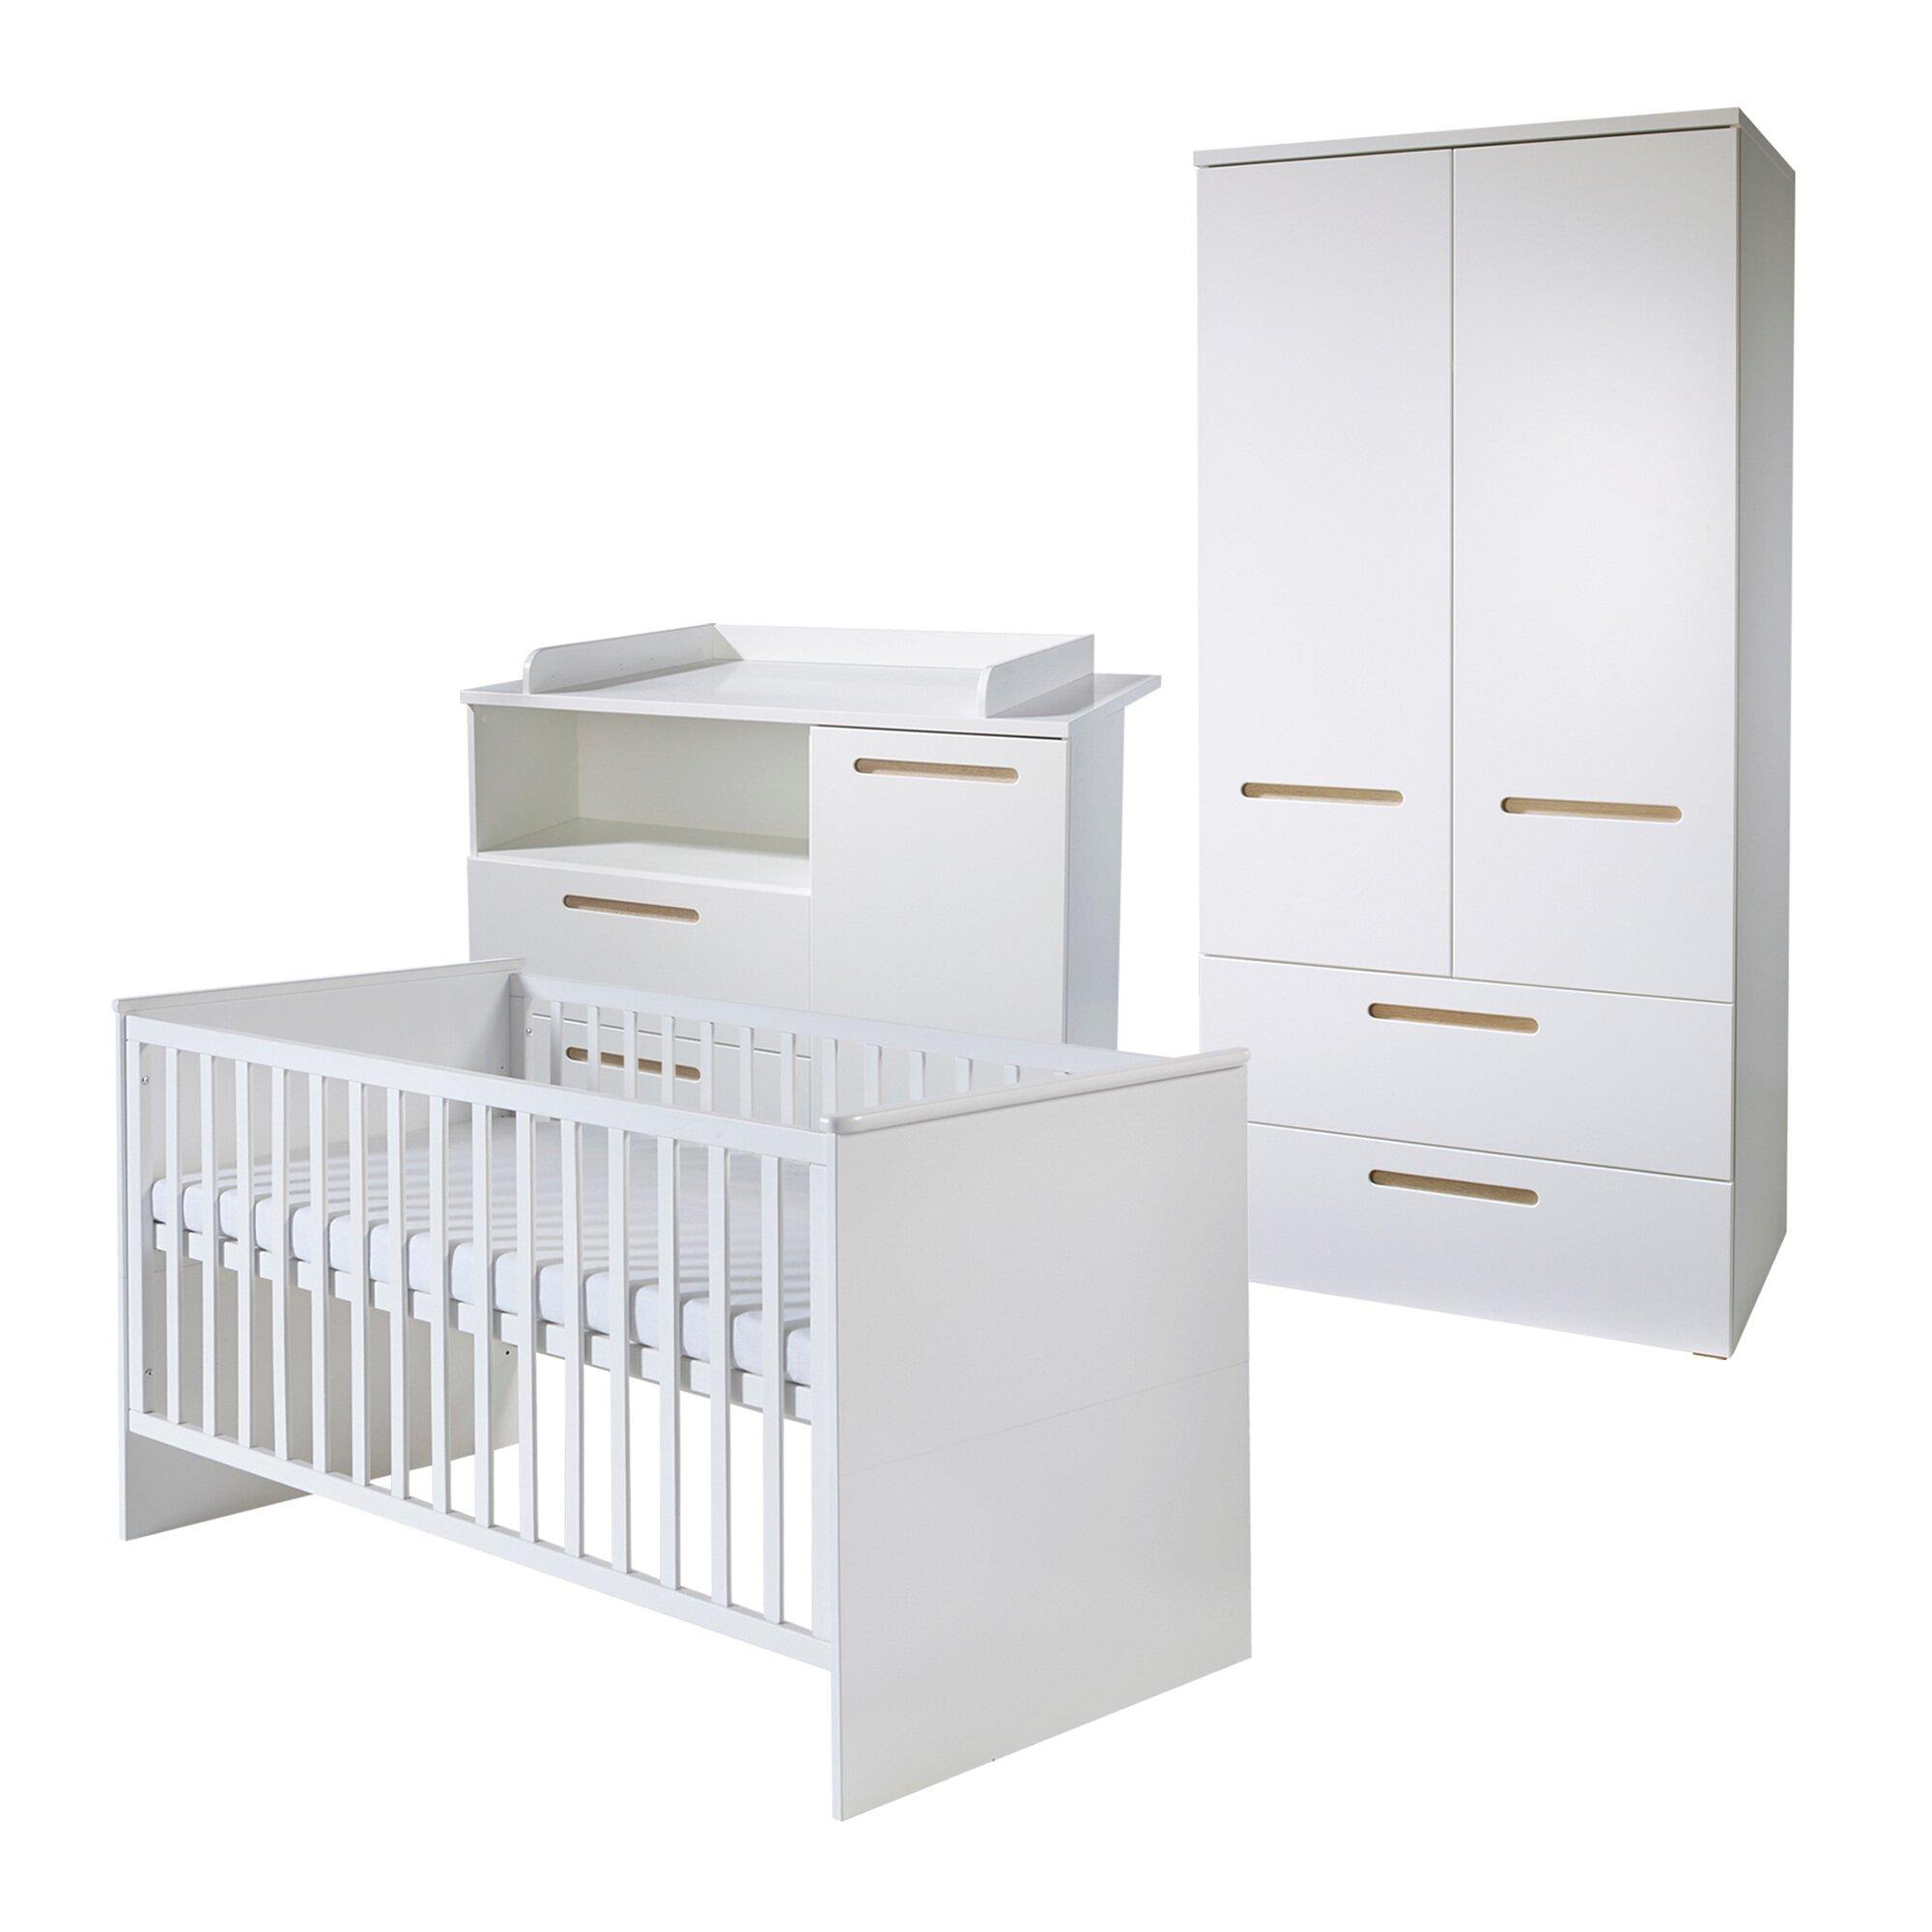 Roba Kinderzimmer-Set CAMBINO CITY (Bett, Wickelkommode, Schrank 2trg.)